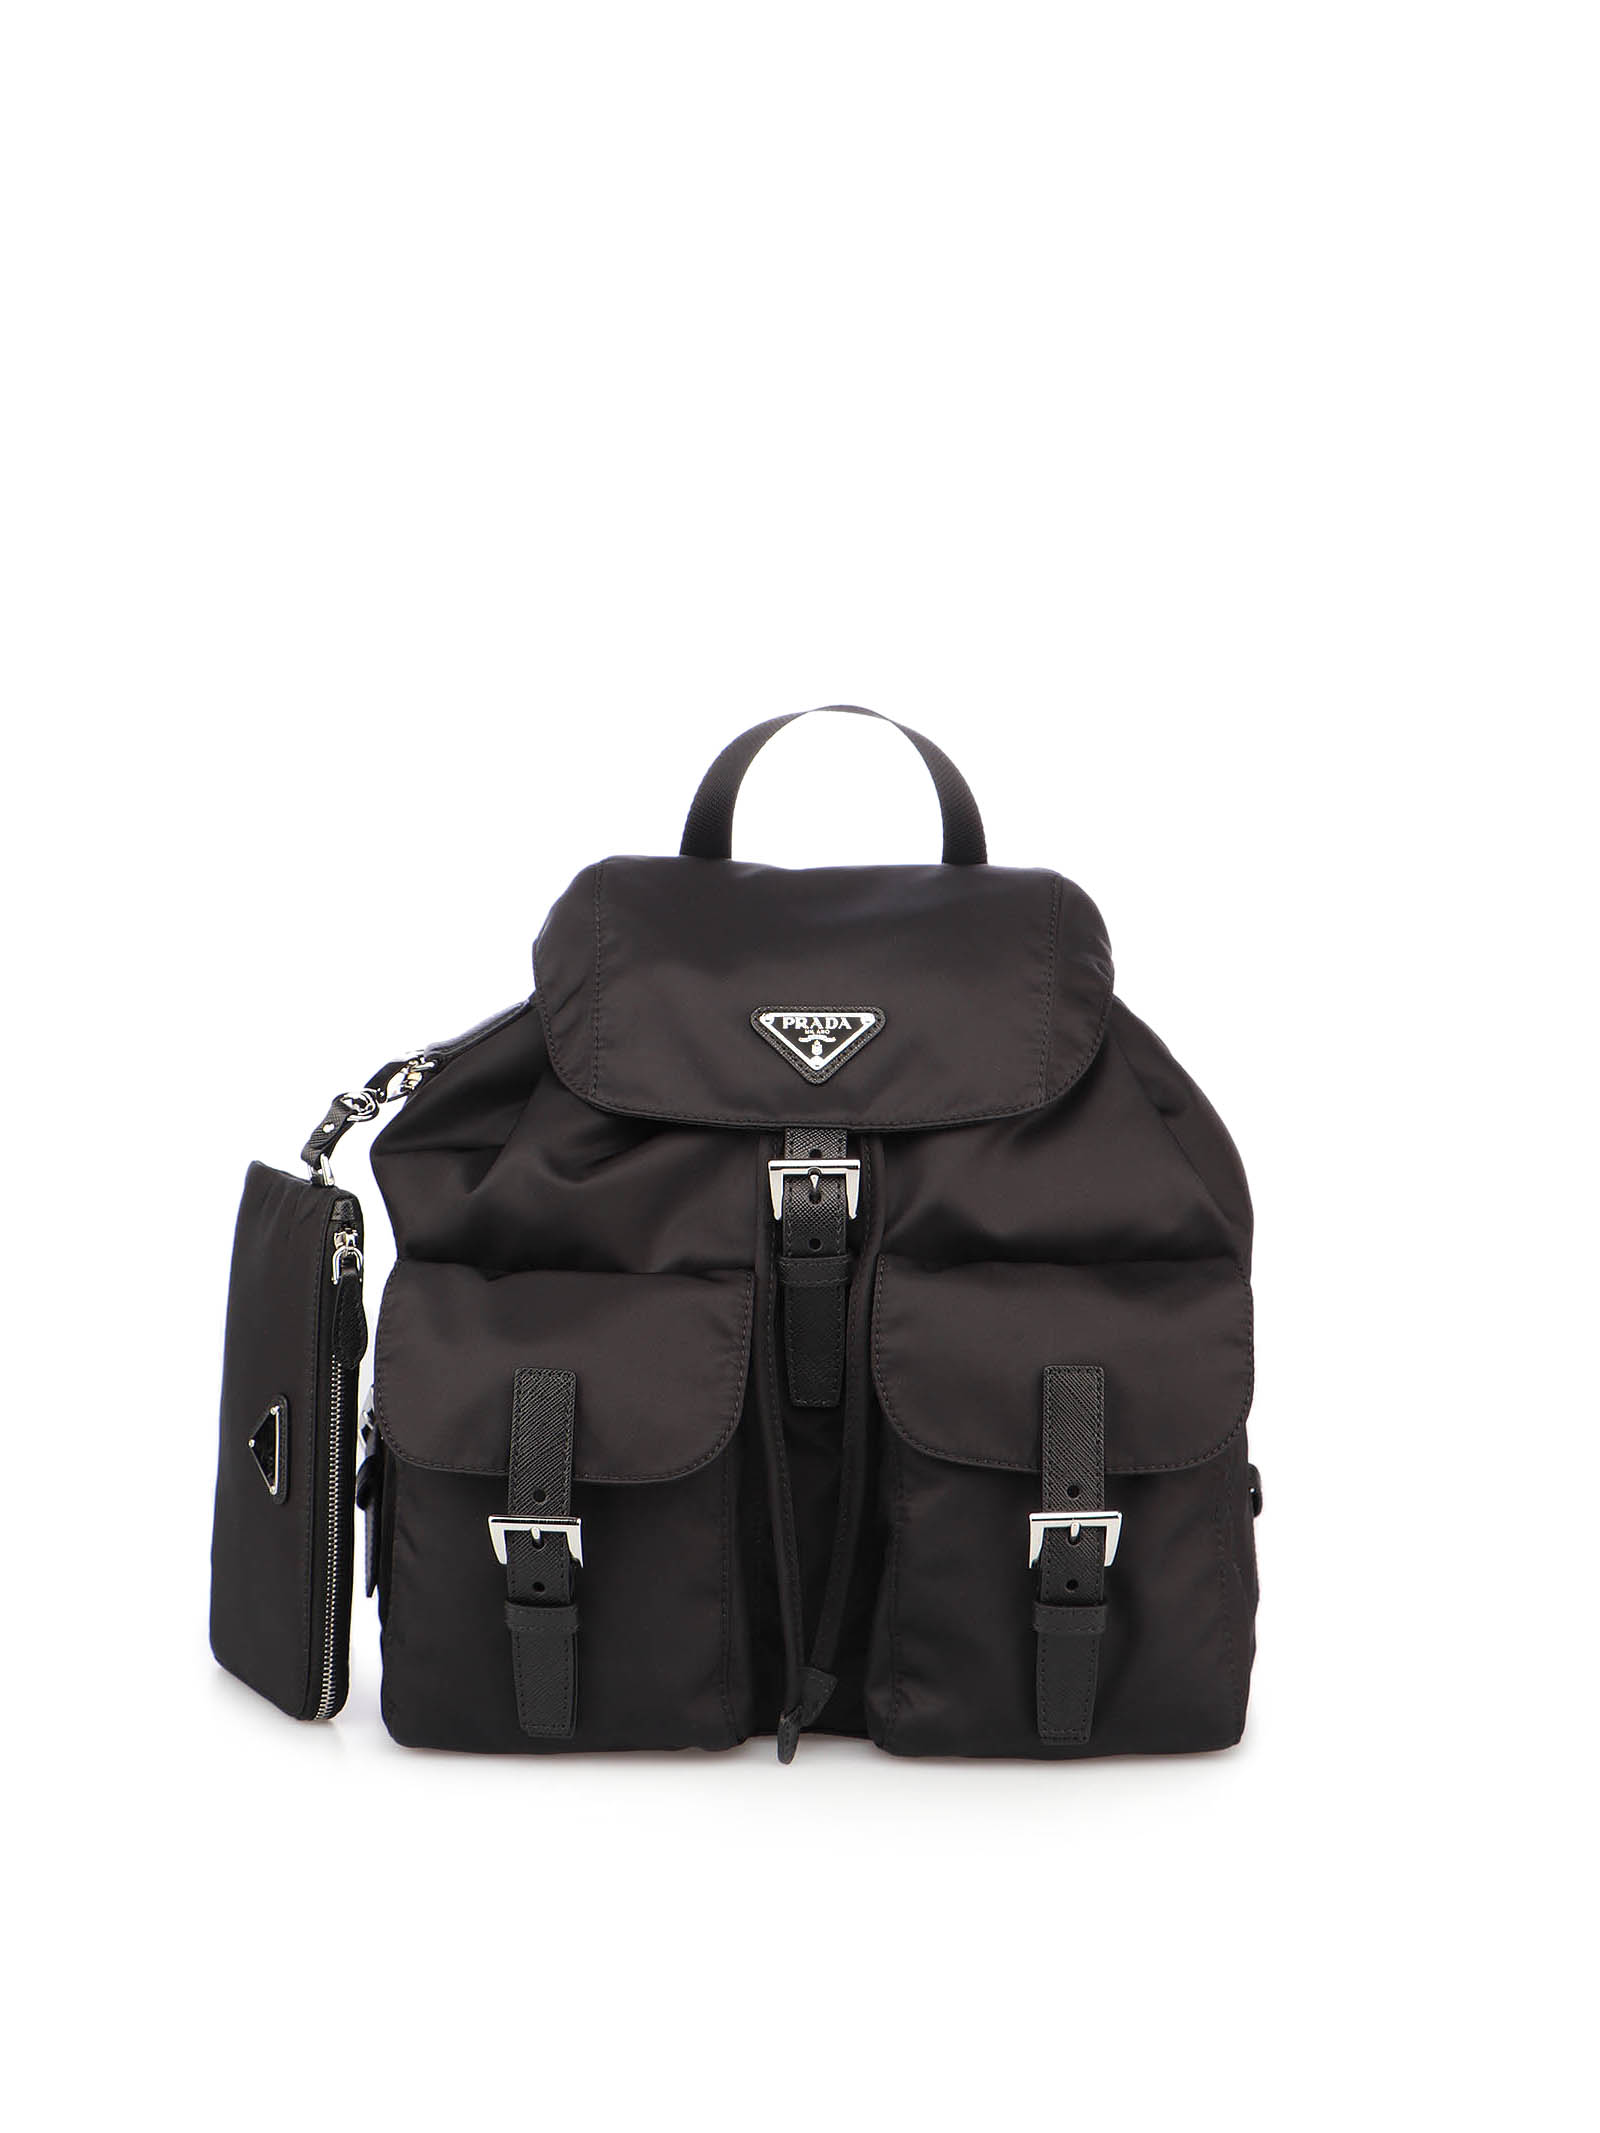 Picture of Prada | Medium Nylon Backpack